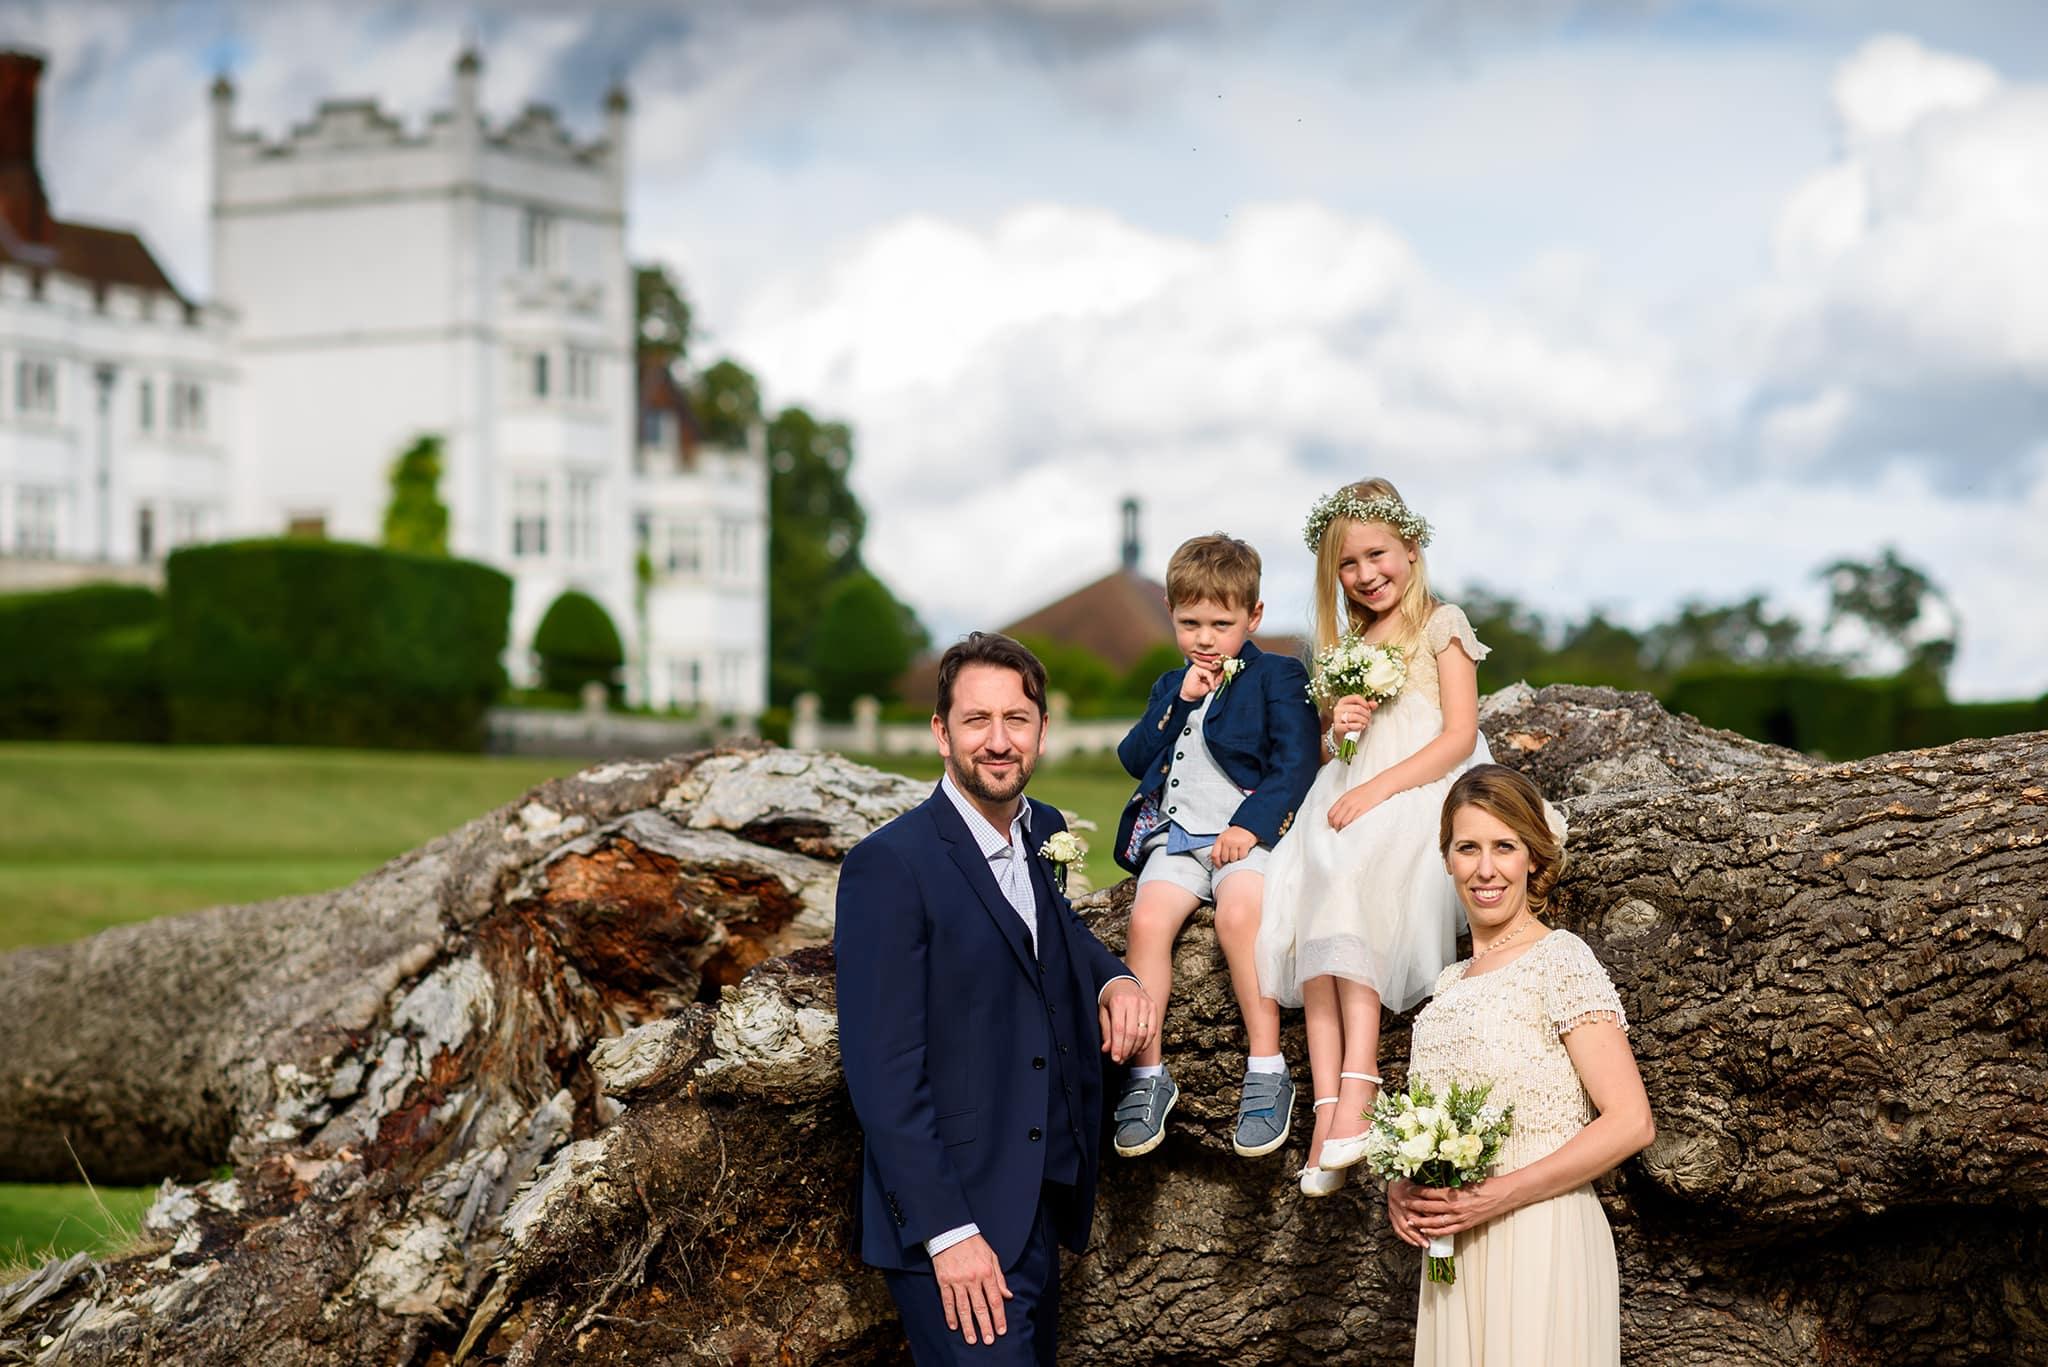 Danesfield house wedding photography